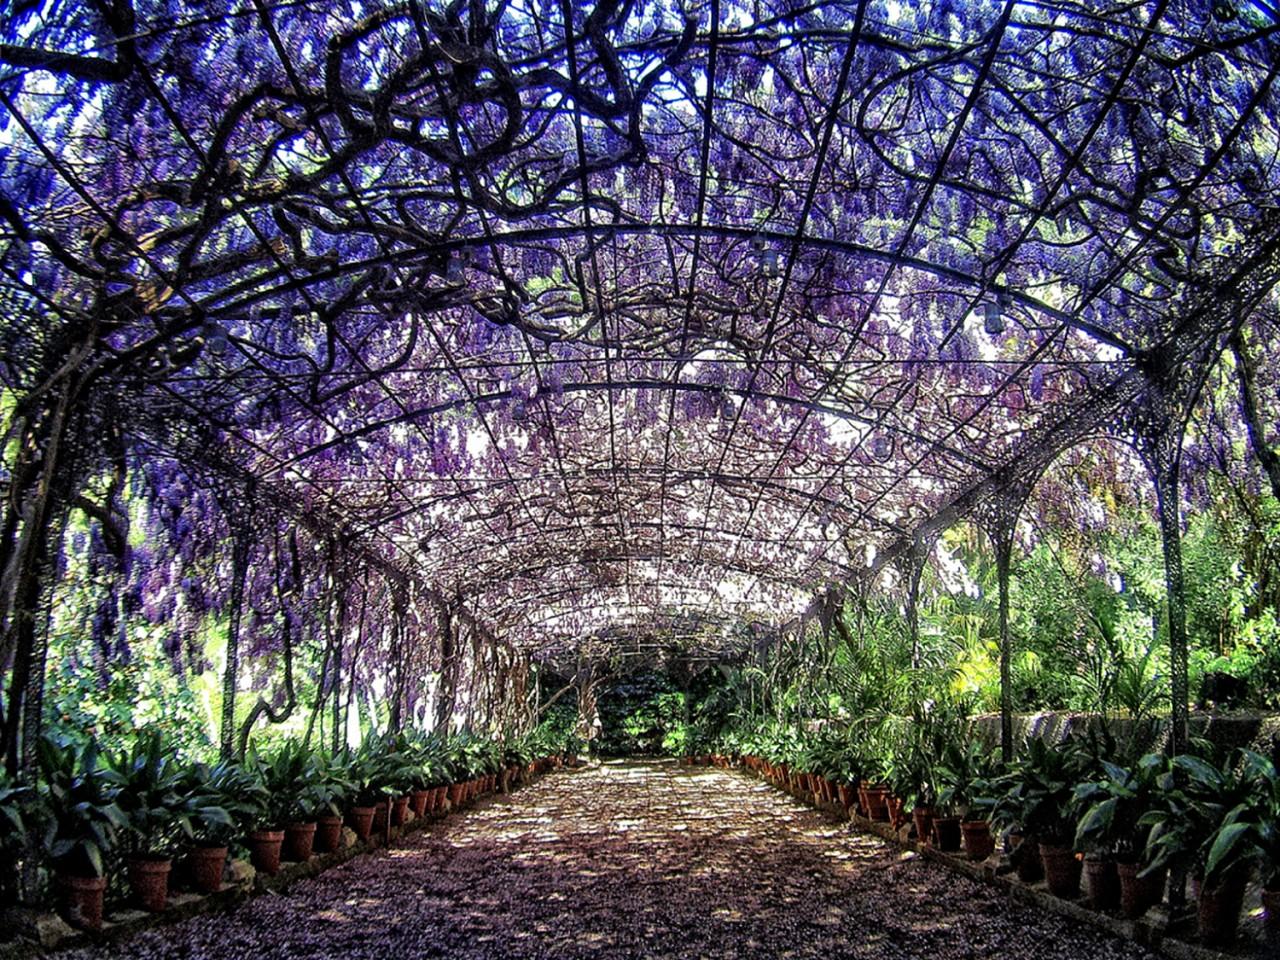 jardinbotanico_laconcepcion_03 -